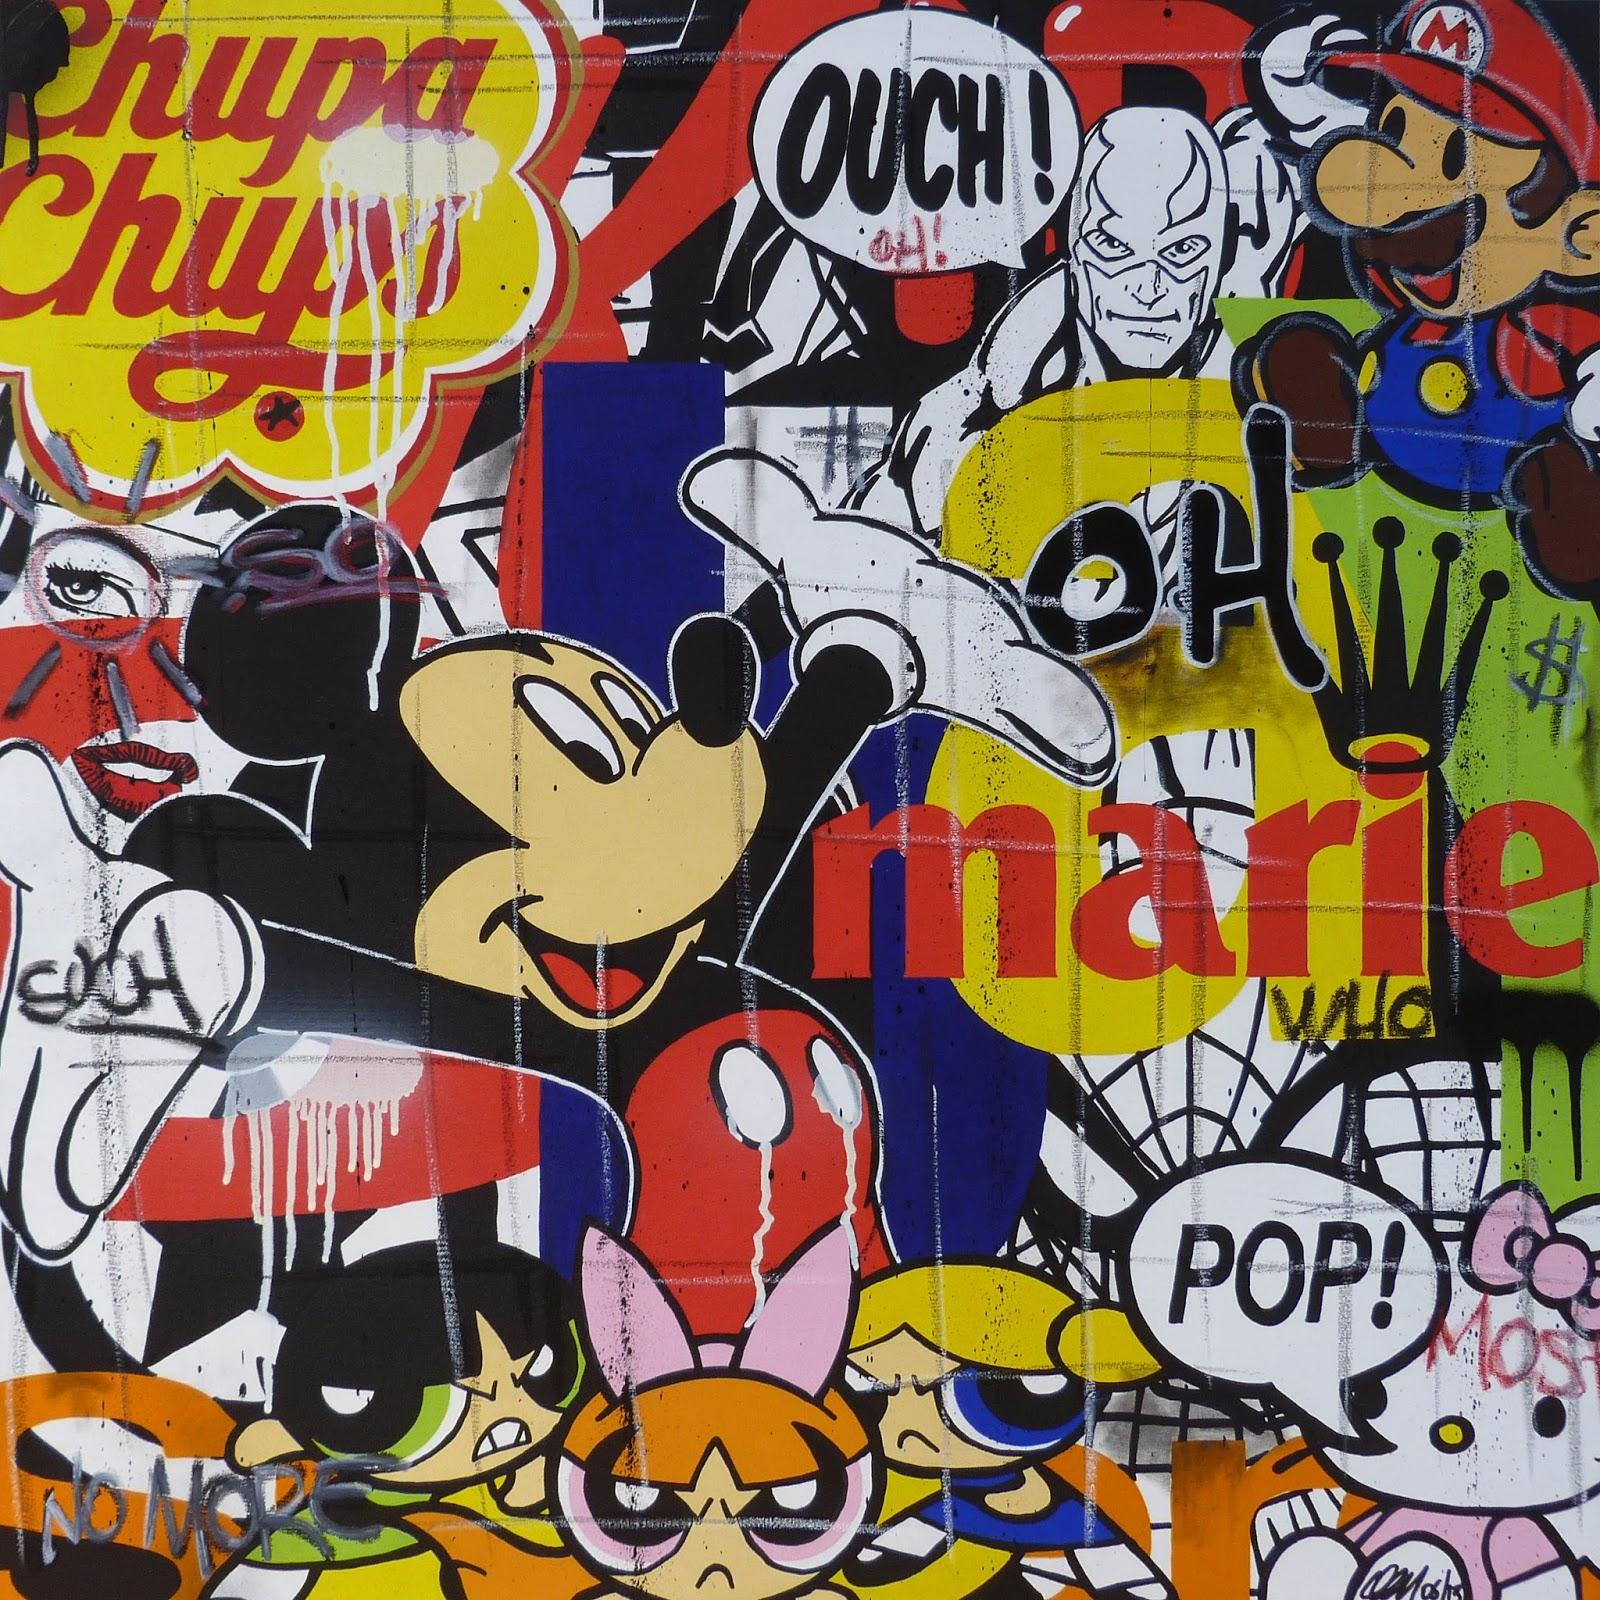 Popkulturelle Cartoon Streetart auf Leinwand von Jerome Clem - Graffiti